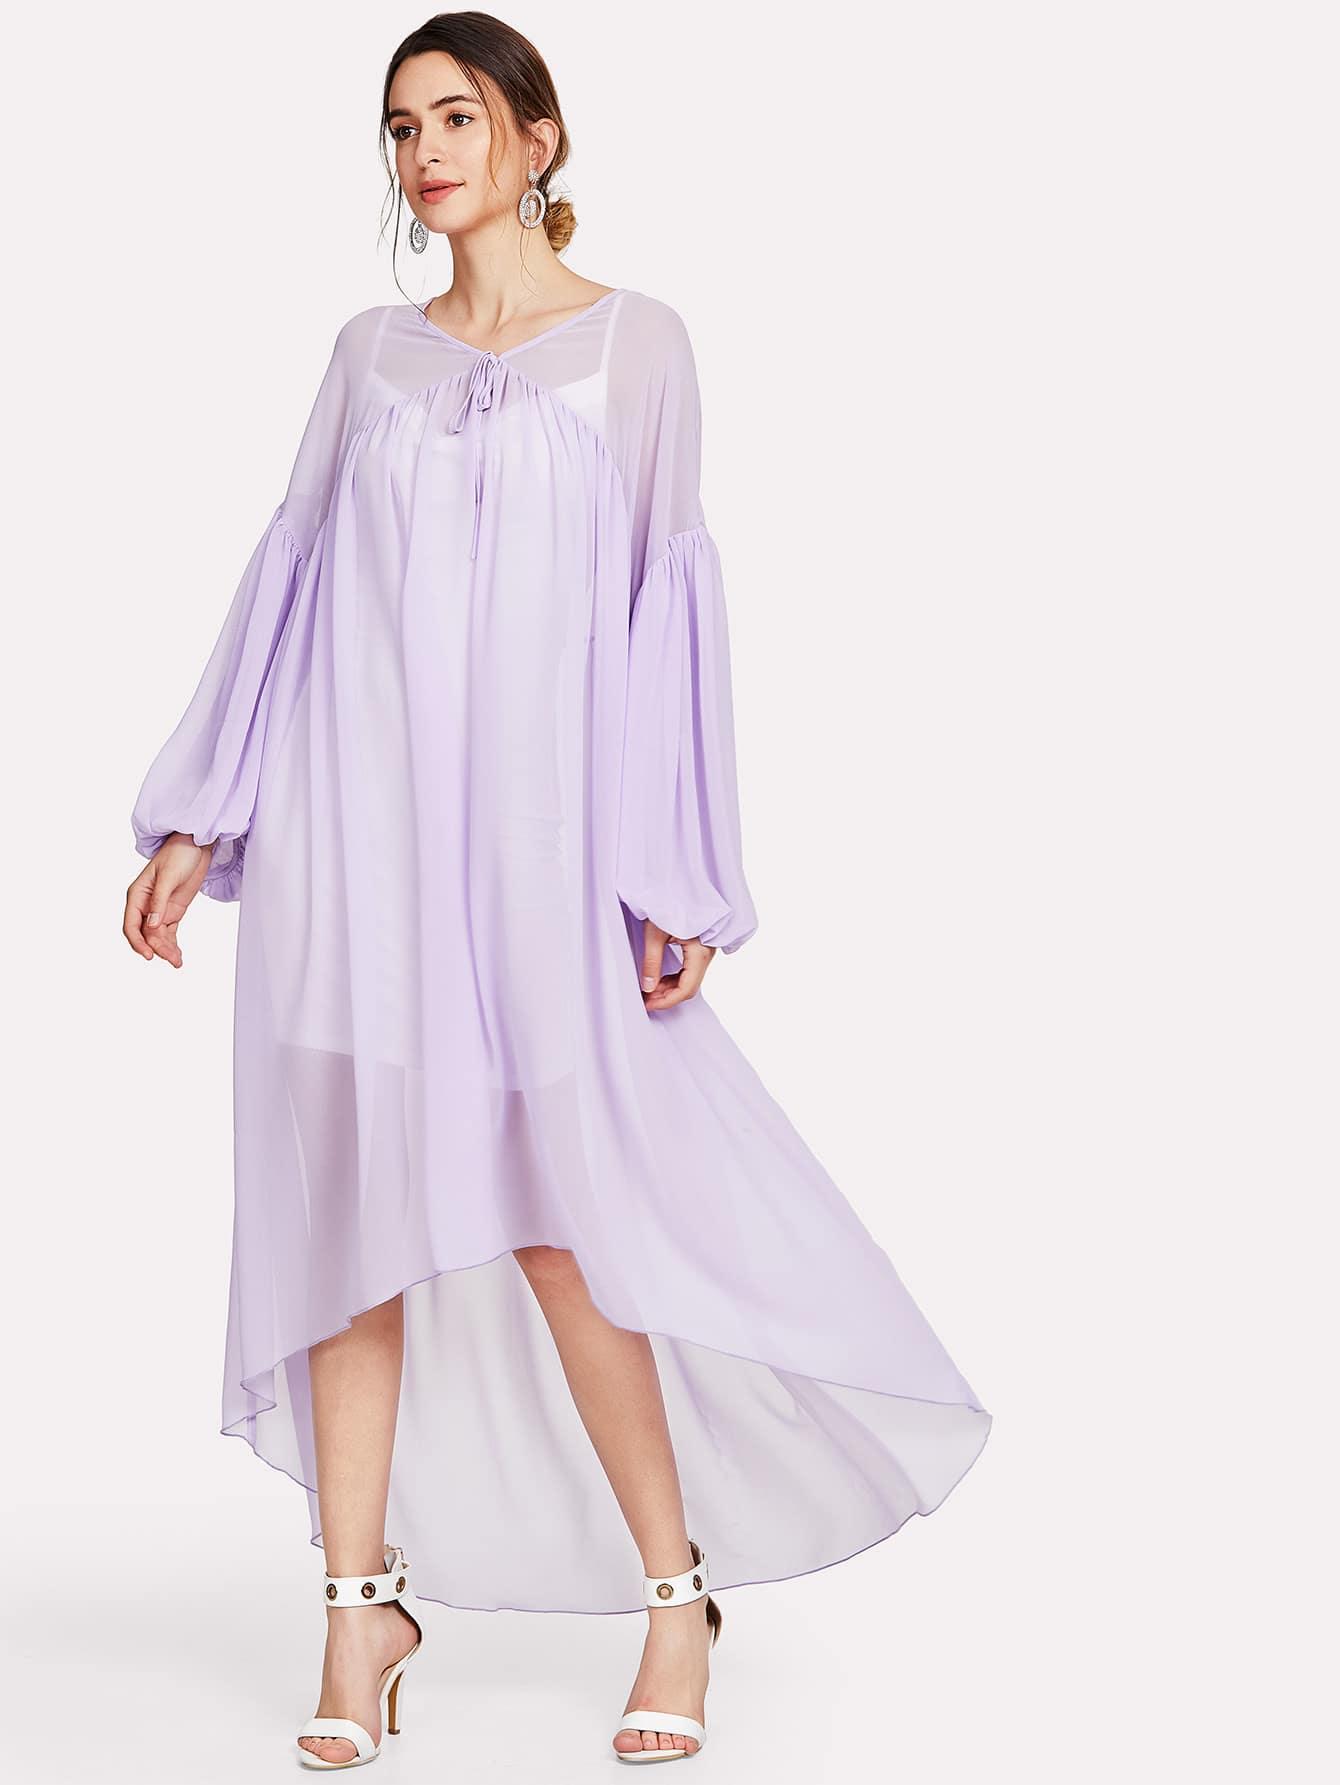 Drop Shoulder Bishop Sleeve Asymmetrical Hem Dress drop shoulder bishop sleeve fuzzy jumper